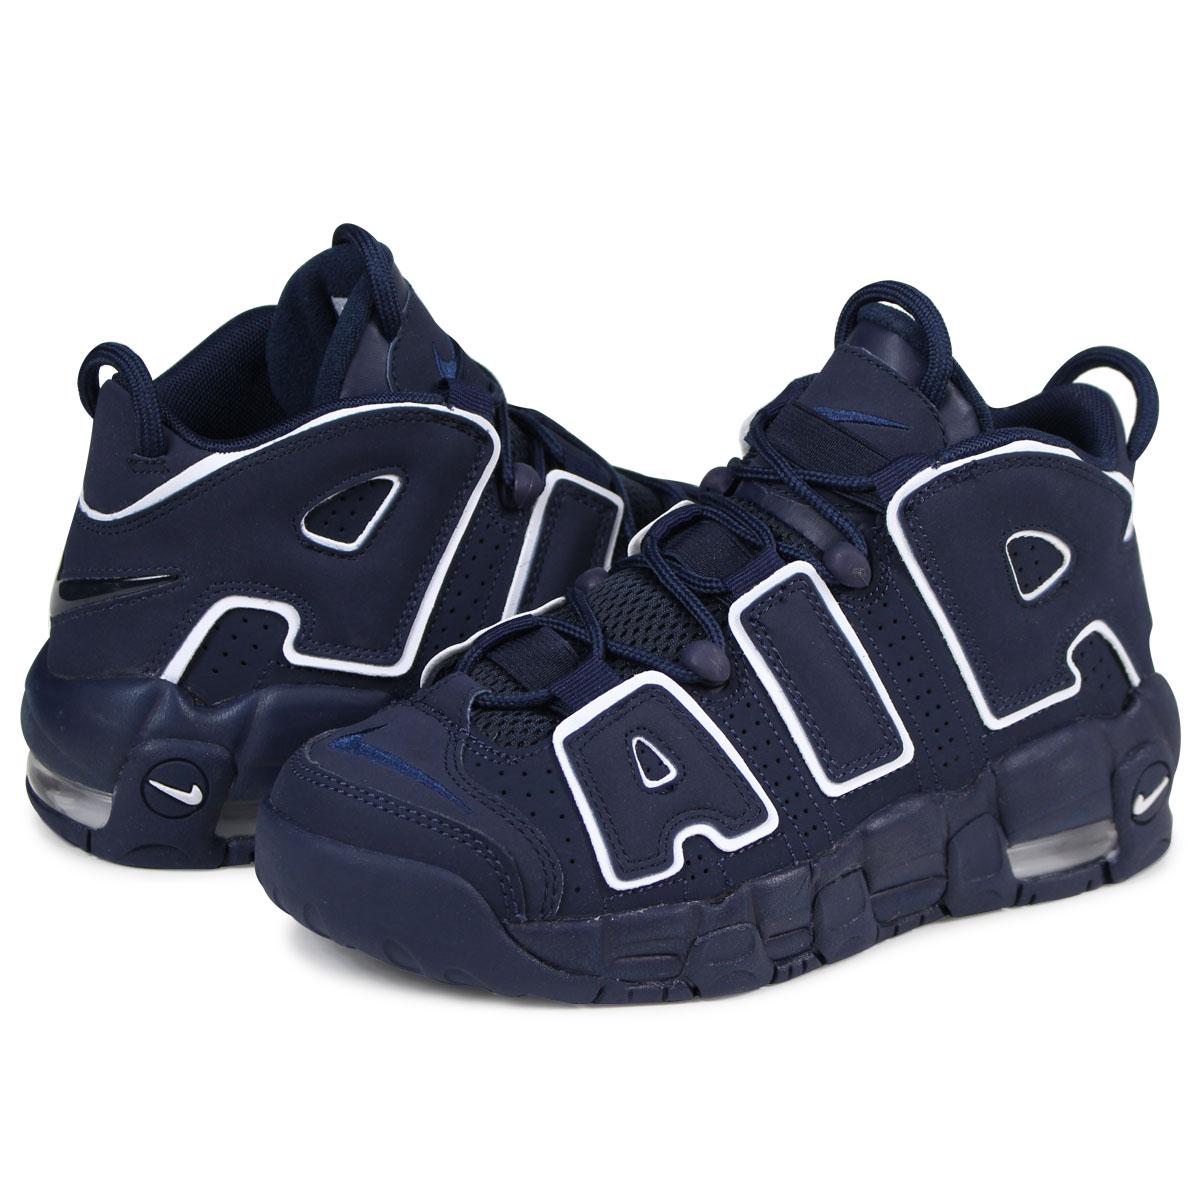 new arrivals 5725d 9dbb4 Whats up Sports  NIKE AIR MORE UPTEMPO BG Nike air more up tempo Lady s  sneakers 415,082-401 navy  2 8 Shinnyu load    Rakuten Global Market